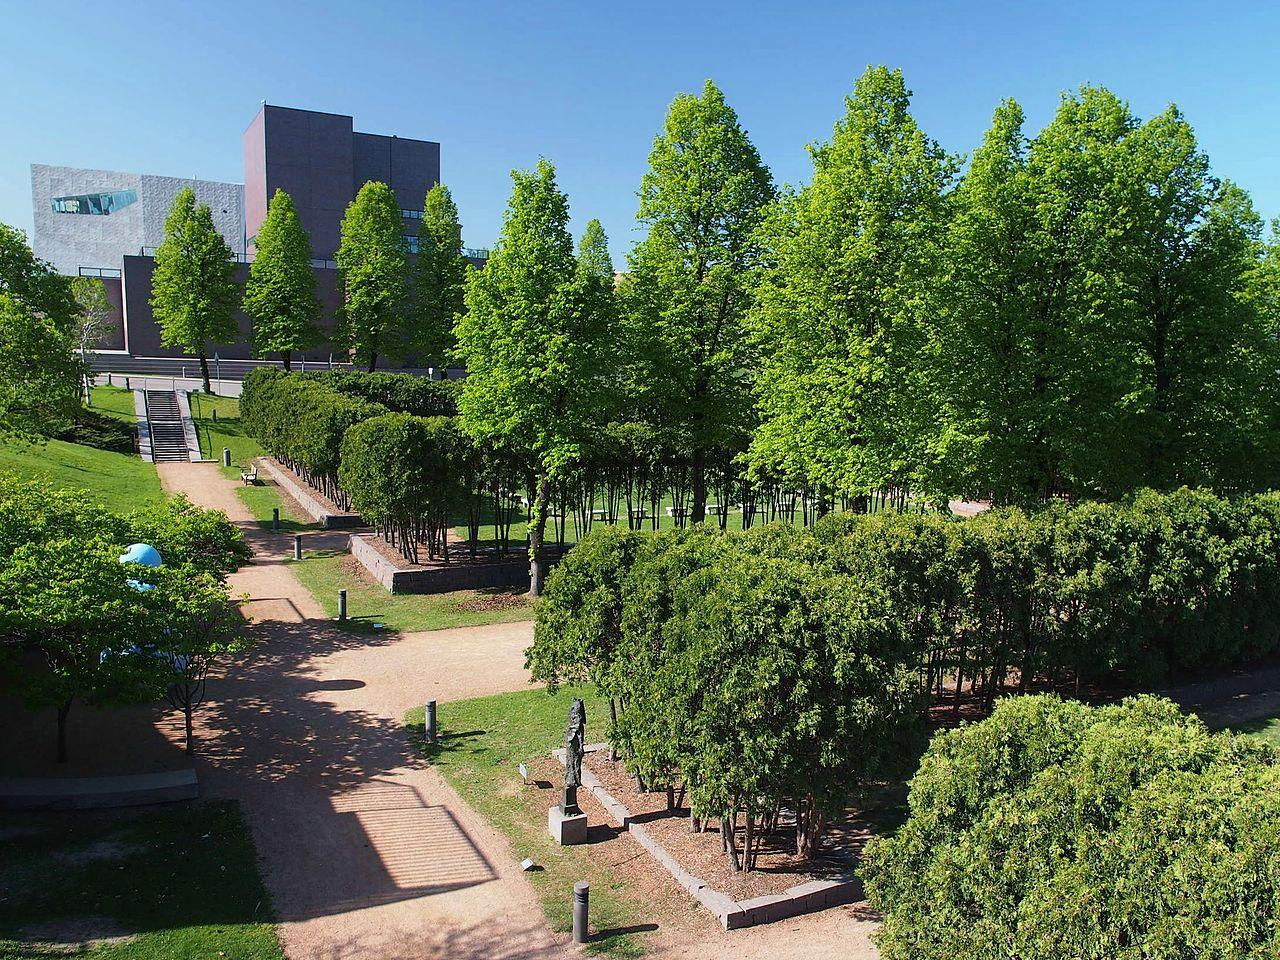 Nice Place to Visit In Minneapolis in Minnesota-Minneapolis Sculpture Garden